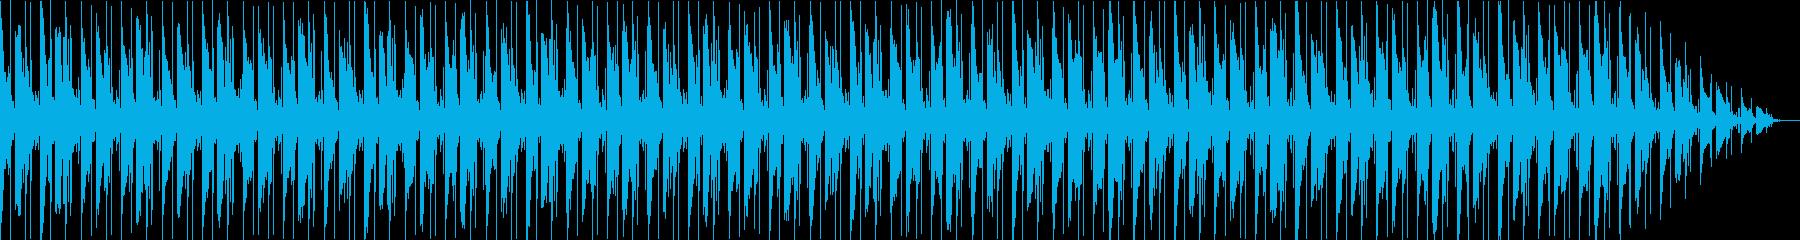 VP・CM 綺麗なディレイサウンドテクノの再生済みの波形